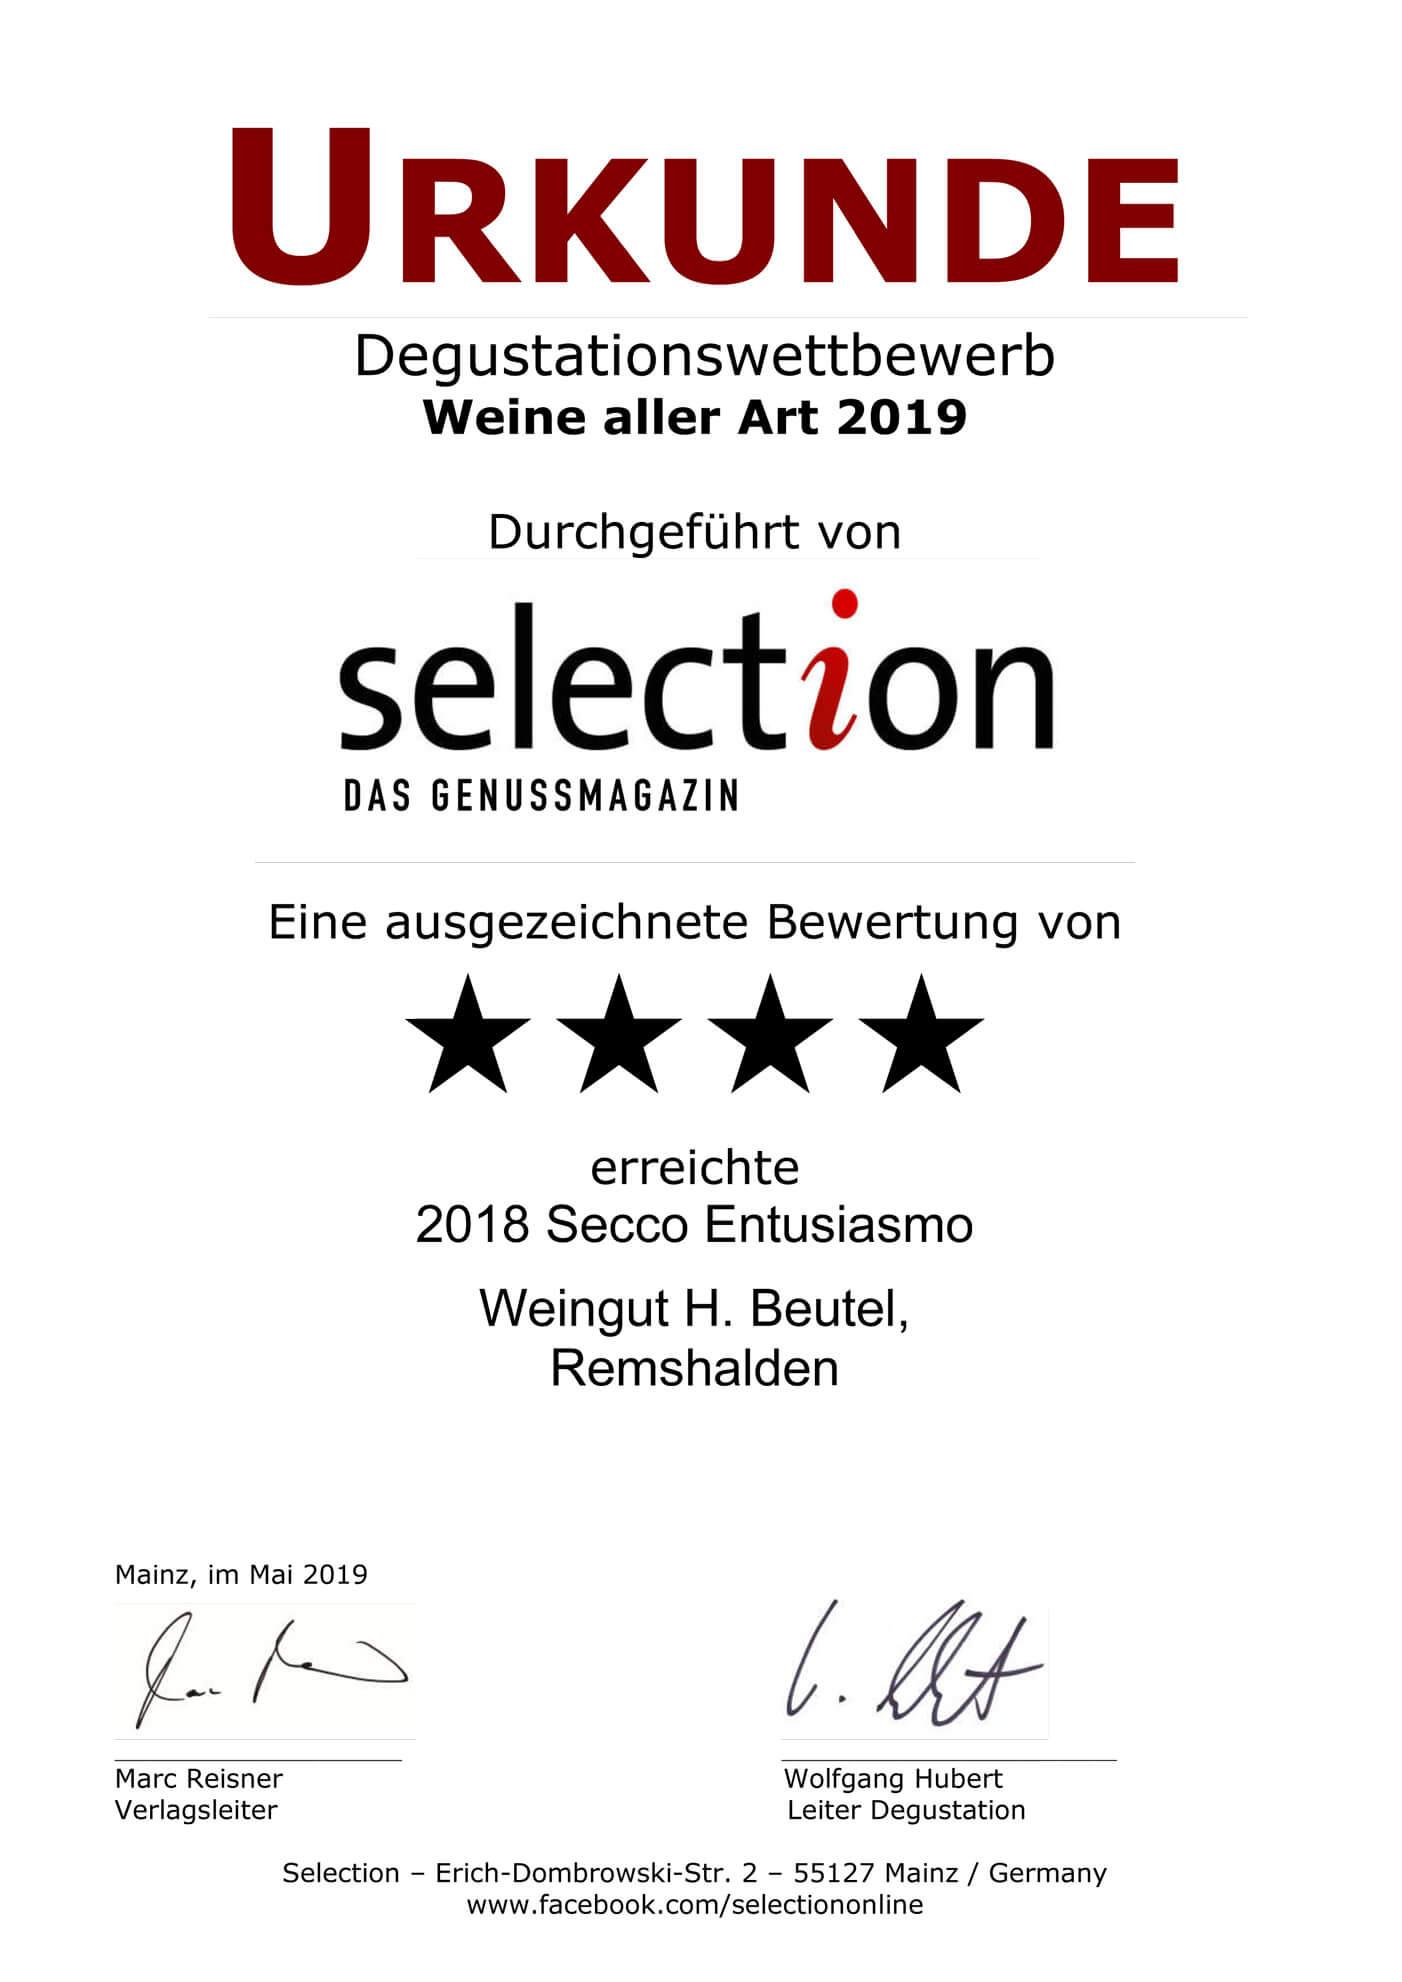 Urkunde SELECTION 2019 - Ausgezeichnet - Secco Entusiasmo 2018